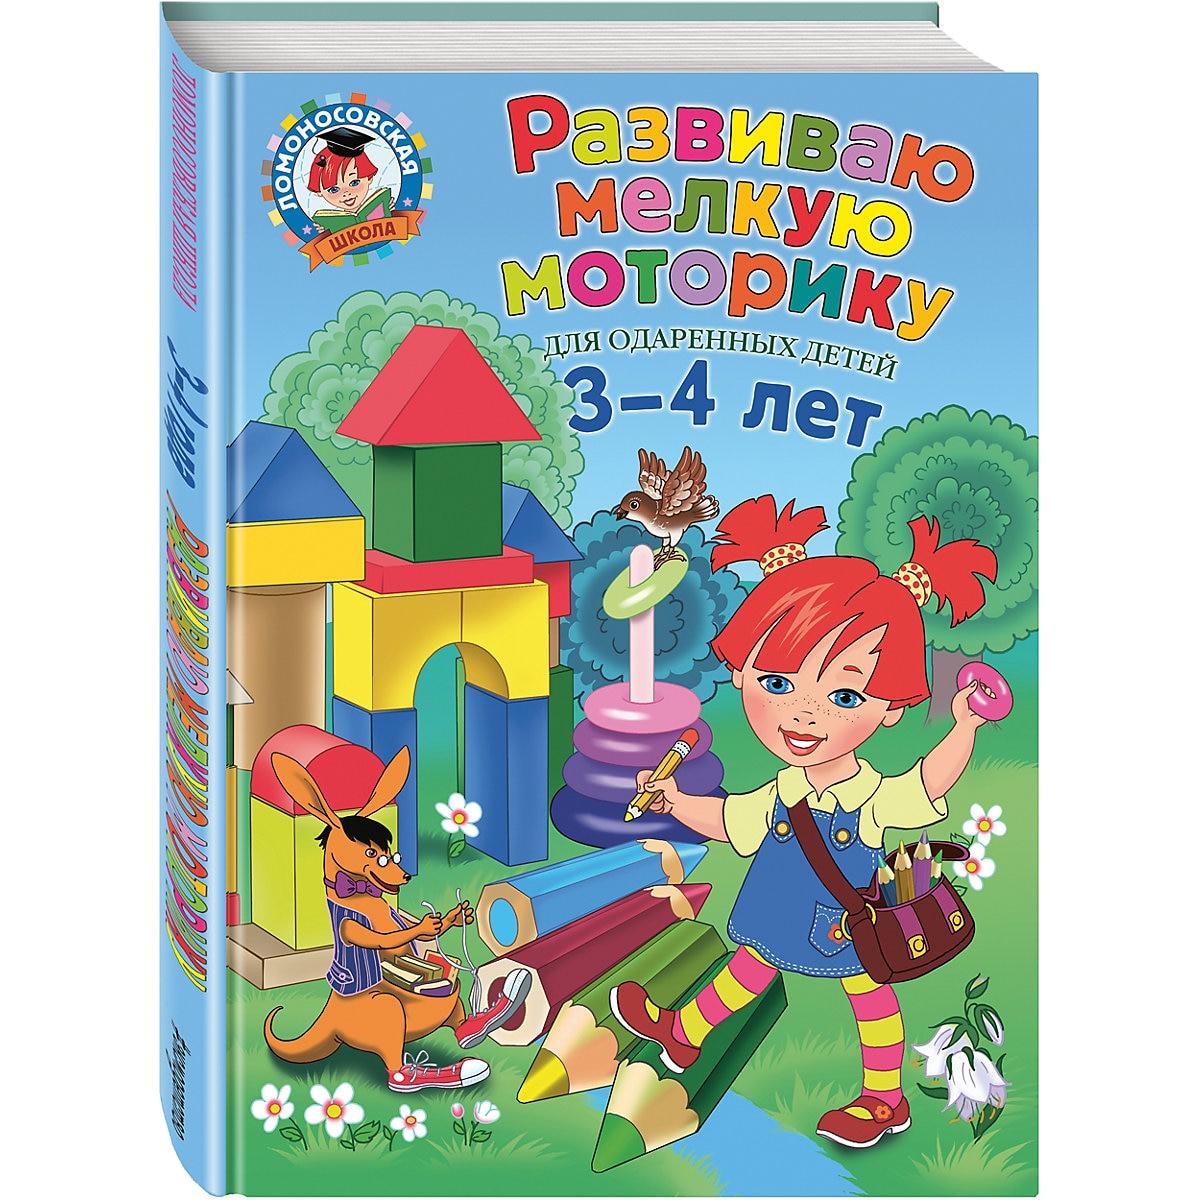 Books EKSMO 7367787 children education encyclopedia alphabet dictionary book for baby MTpromo